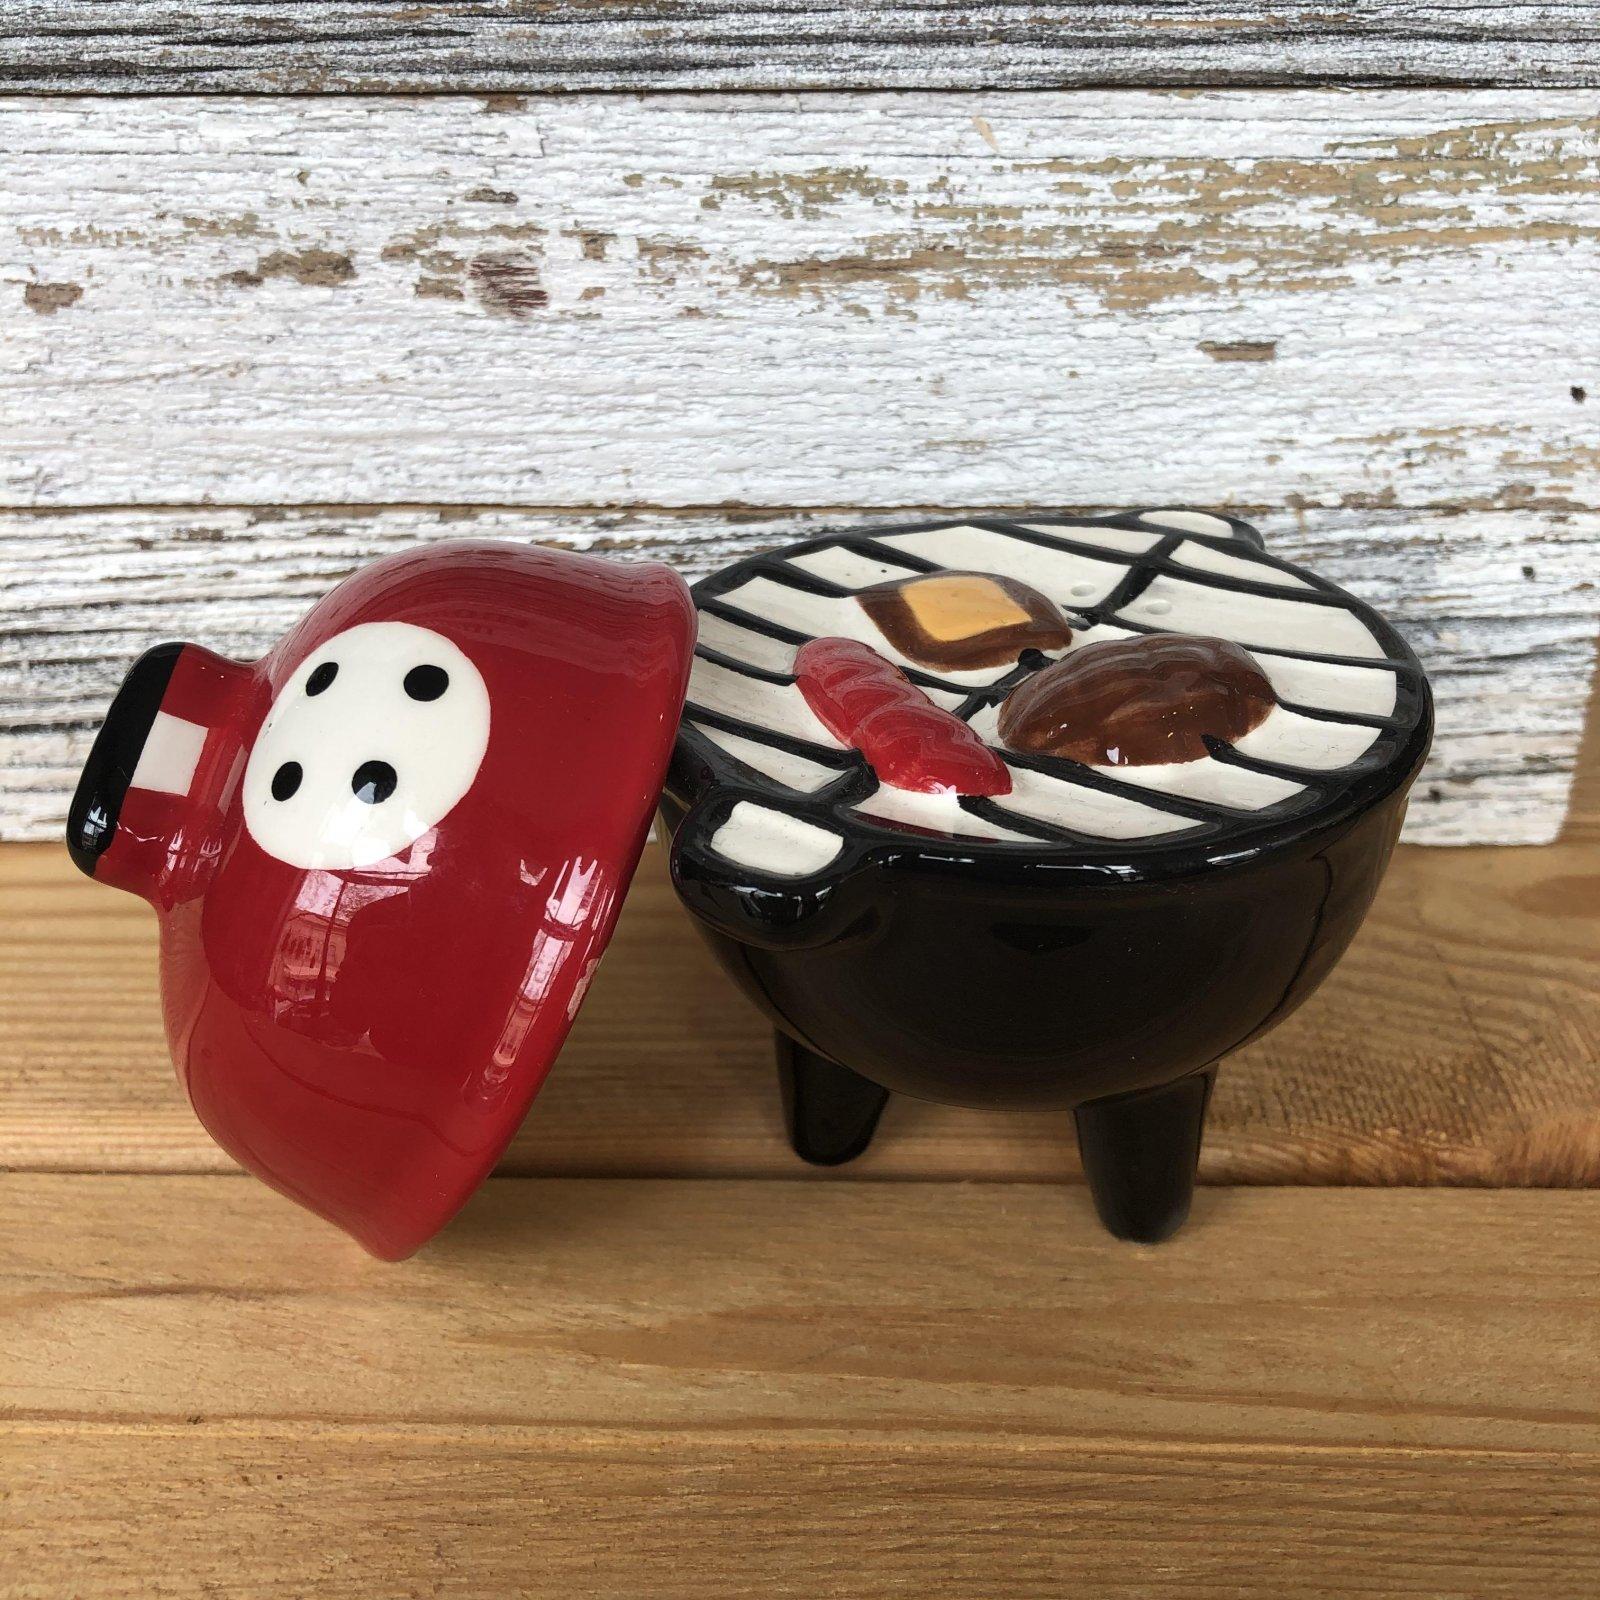 Grill Salt & Pepper Shakers